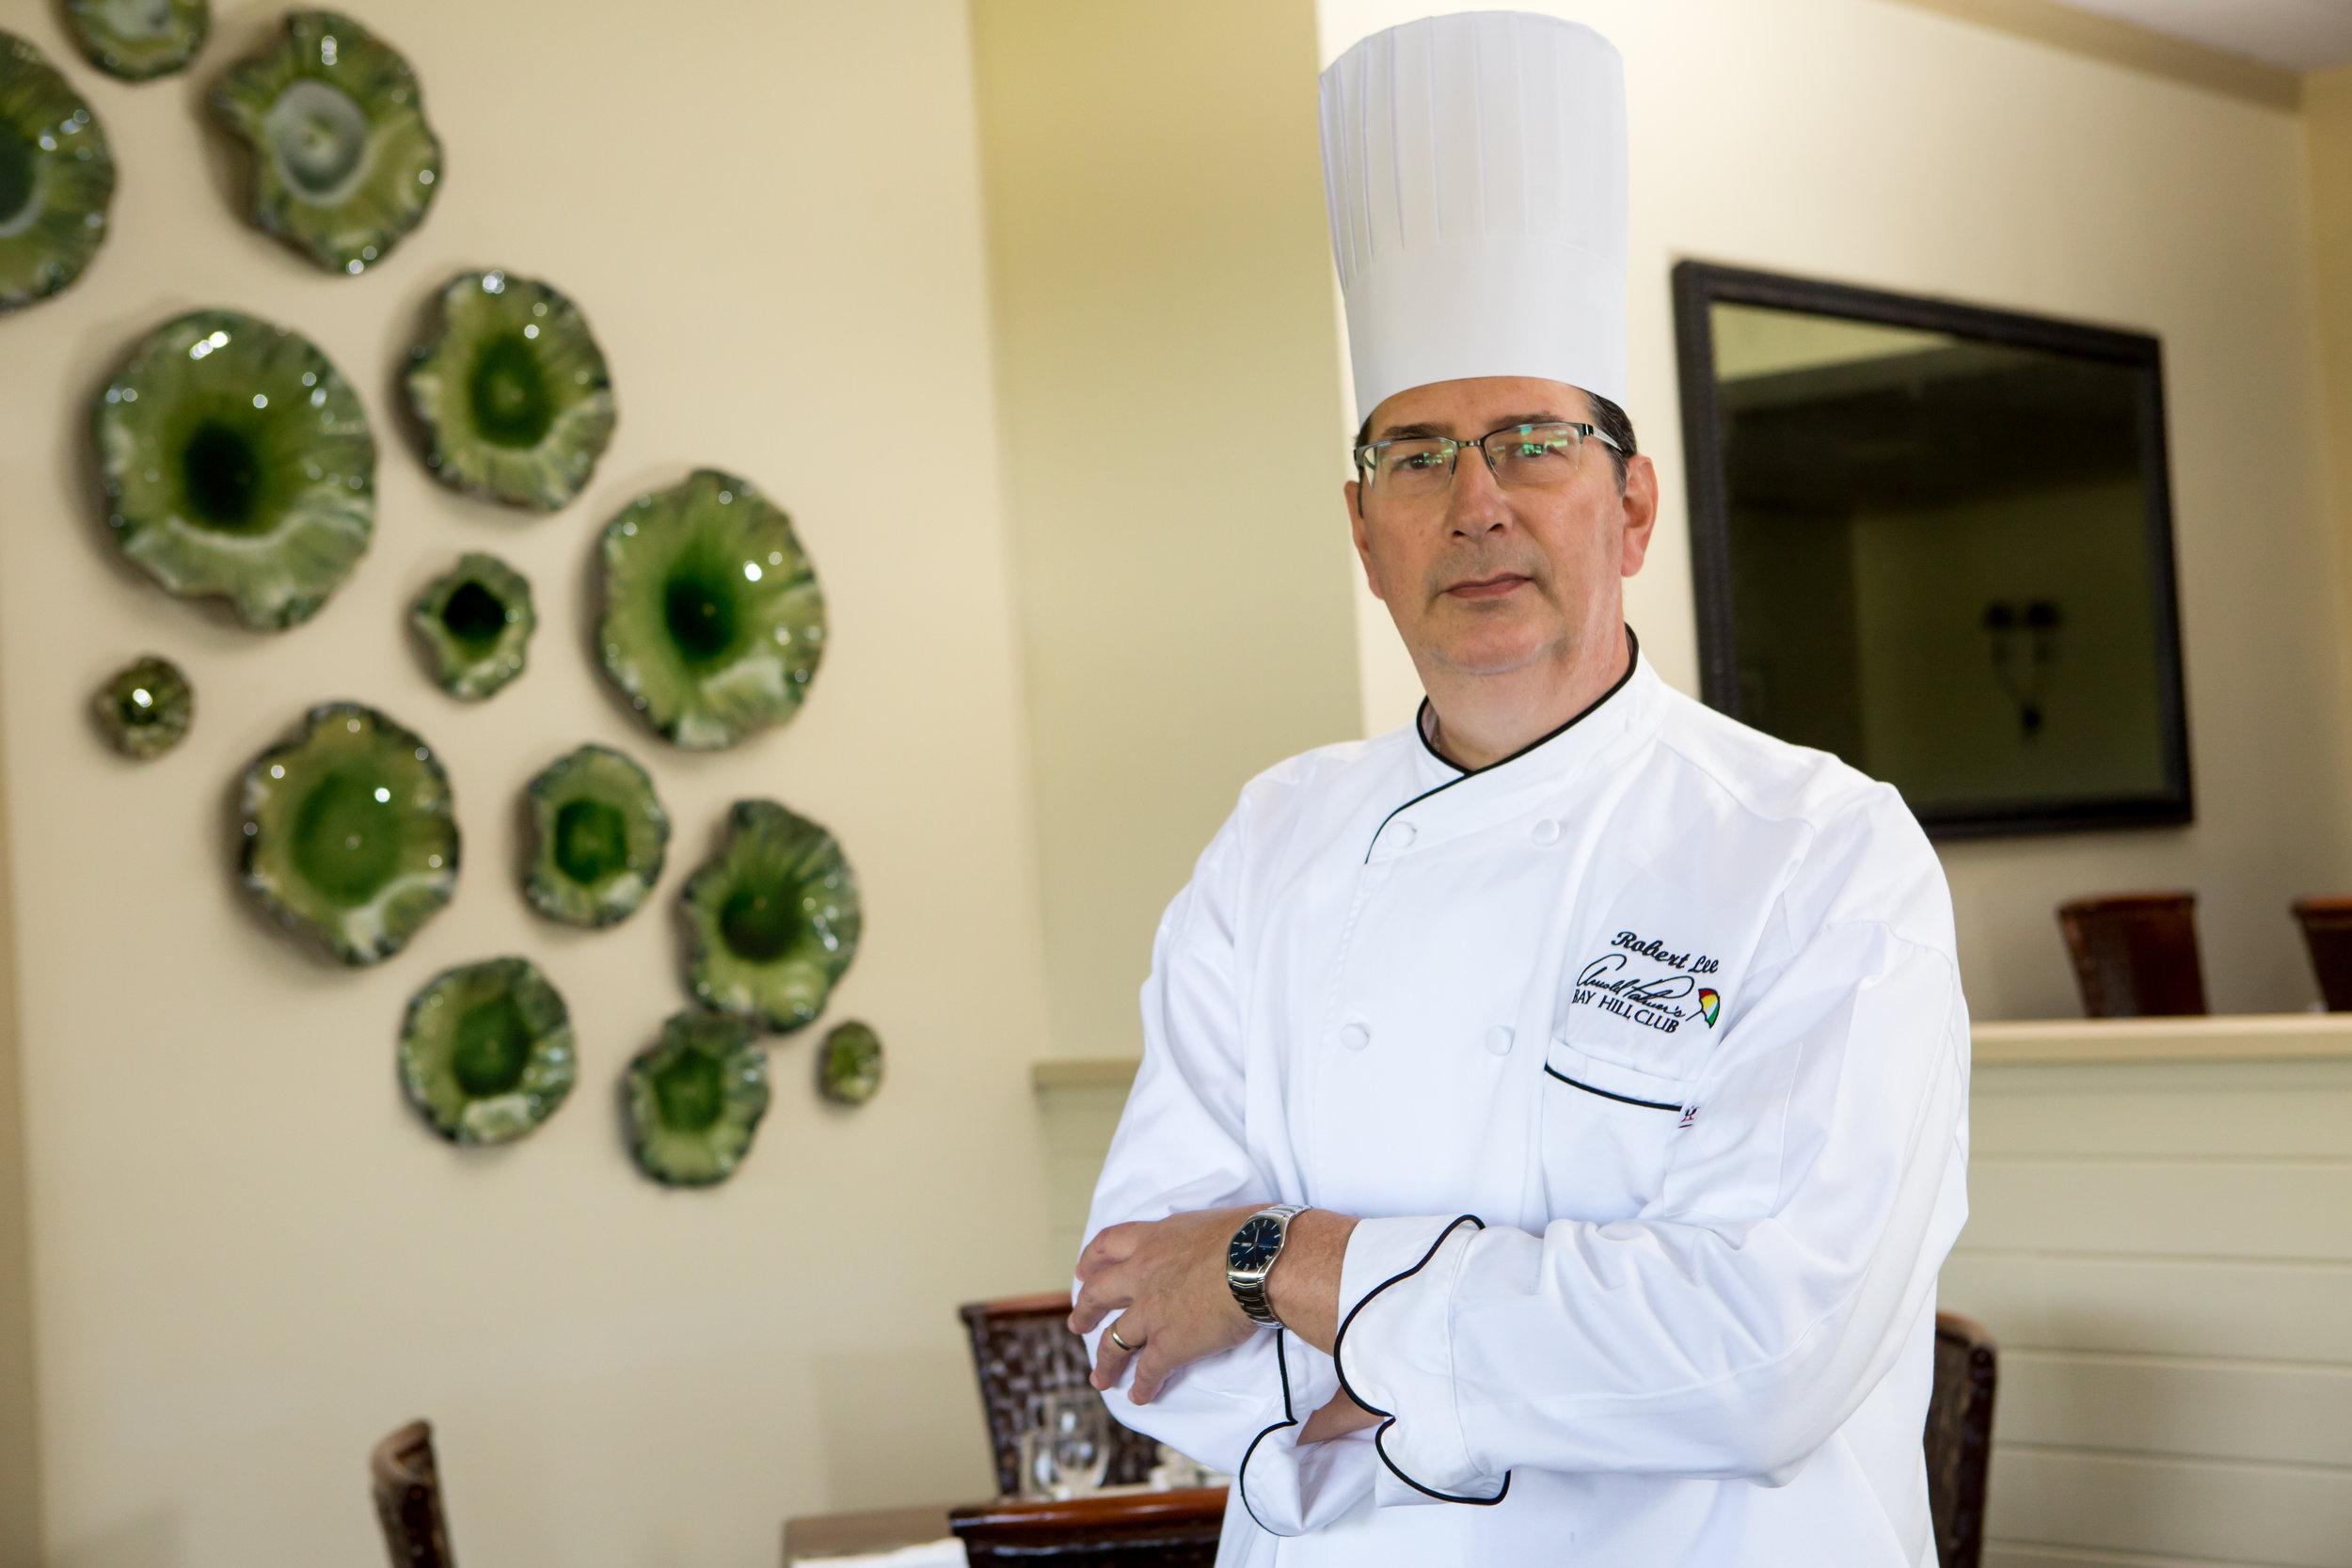 food-photography-chef-portrait-golf-dynamite-studio-chef-portrait.jpg